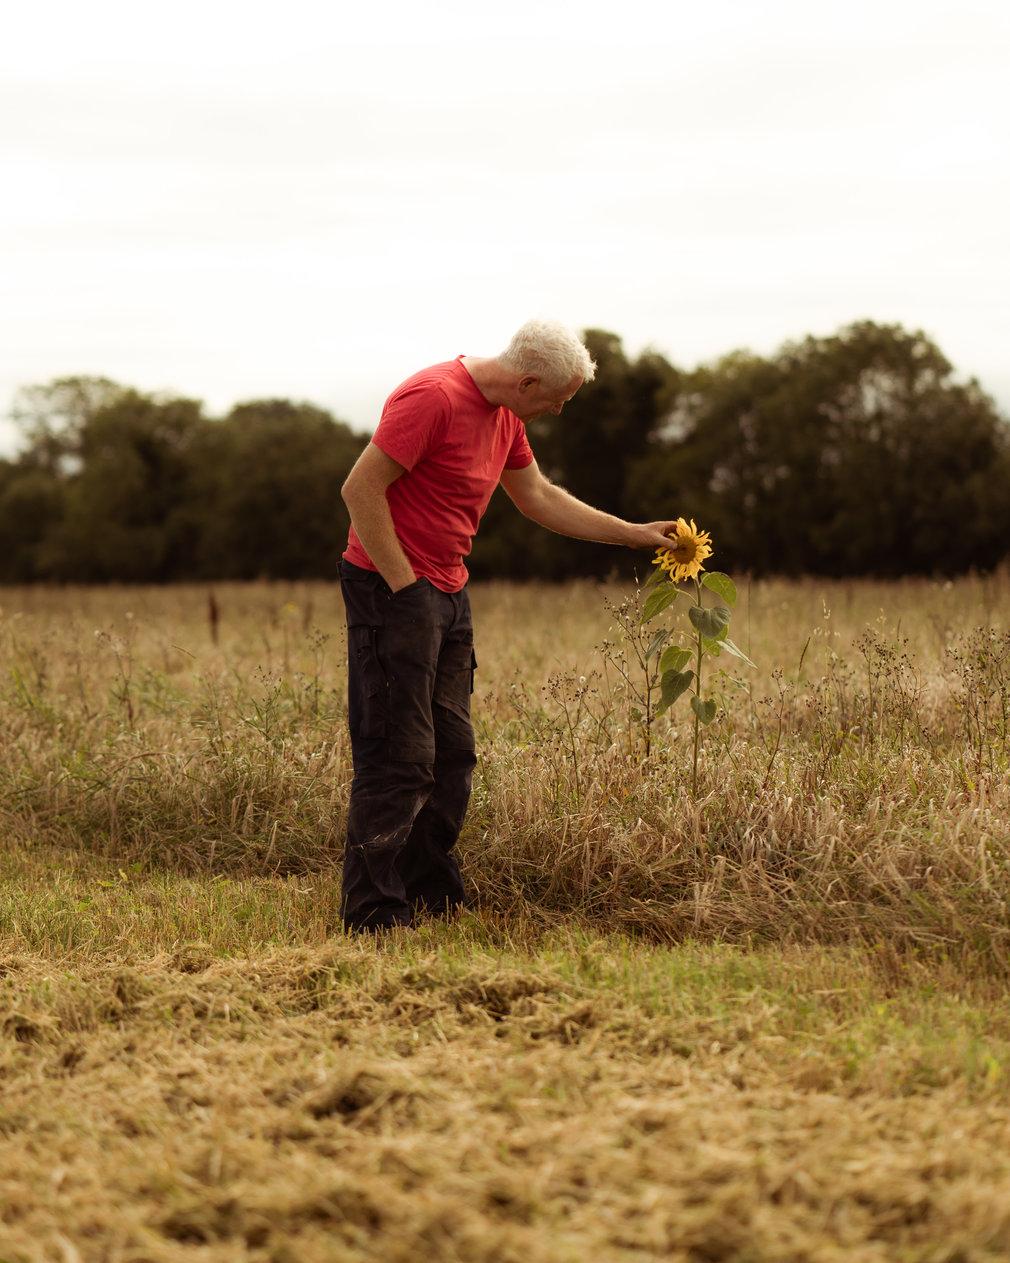 rsz_wd-trevor-harris-harvest-2019-web-20